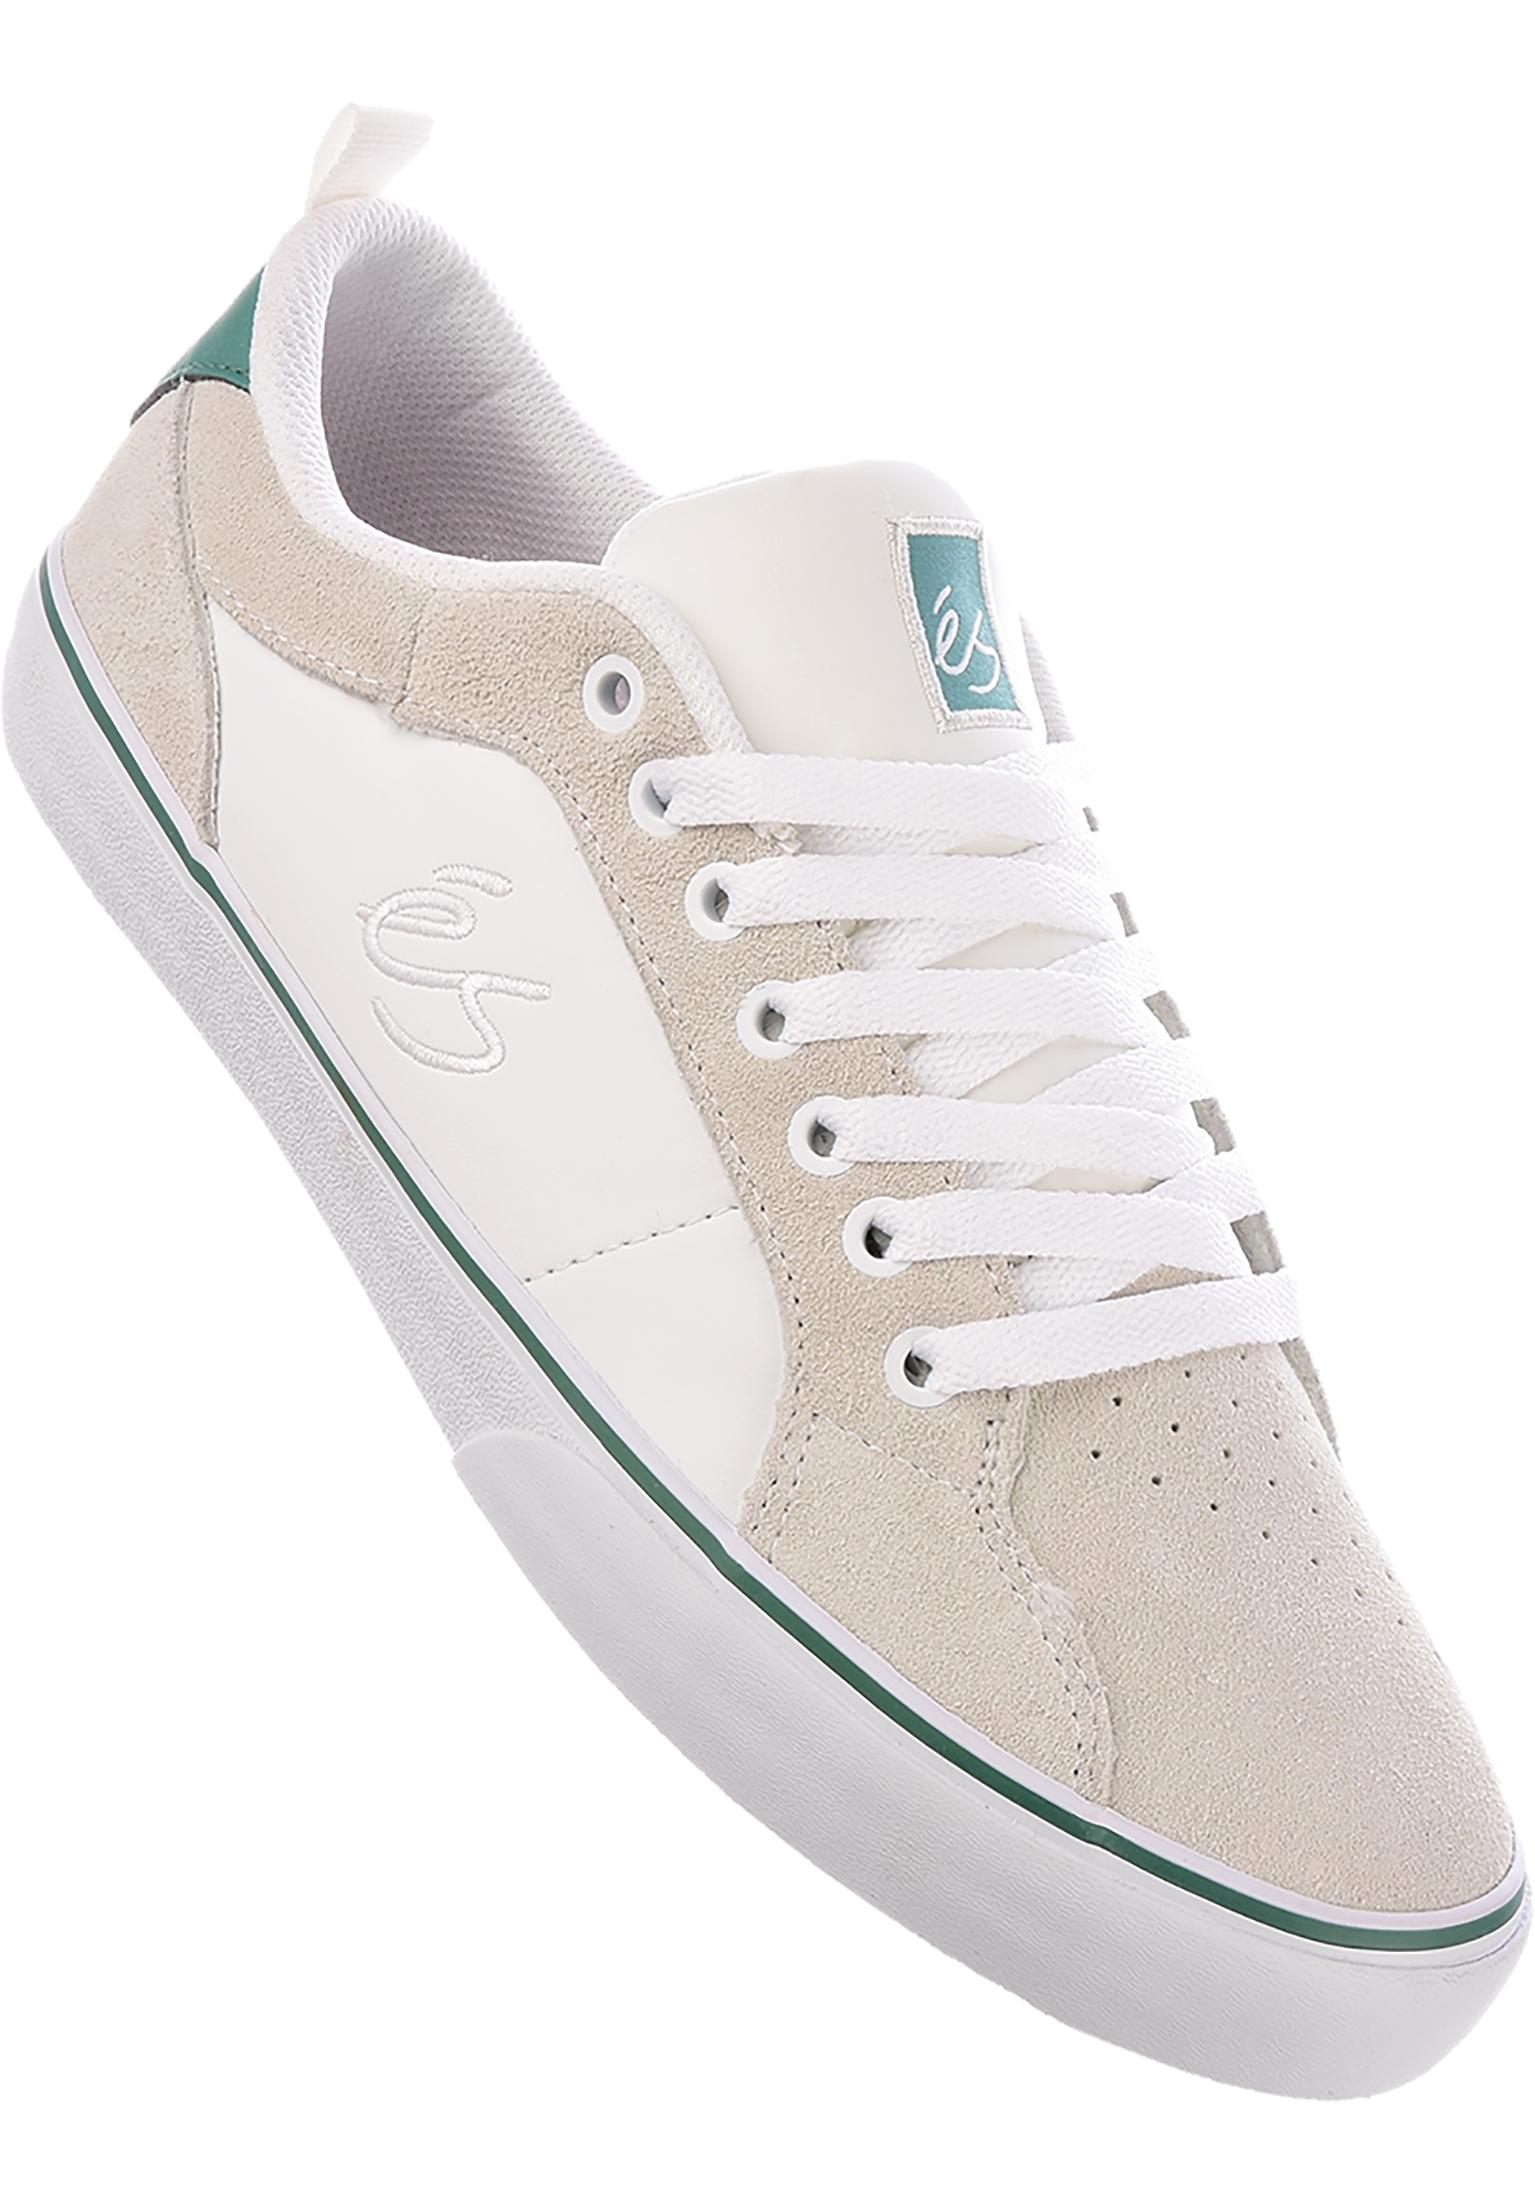 new product cb718 68c33 Skate-Schuhe   Sneakers online kaufen   Titus.de   Titus